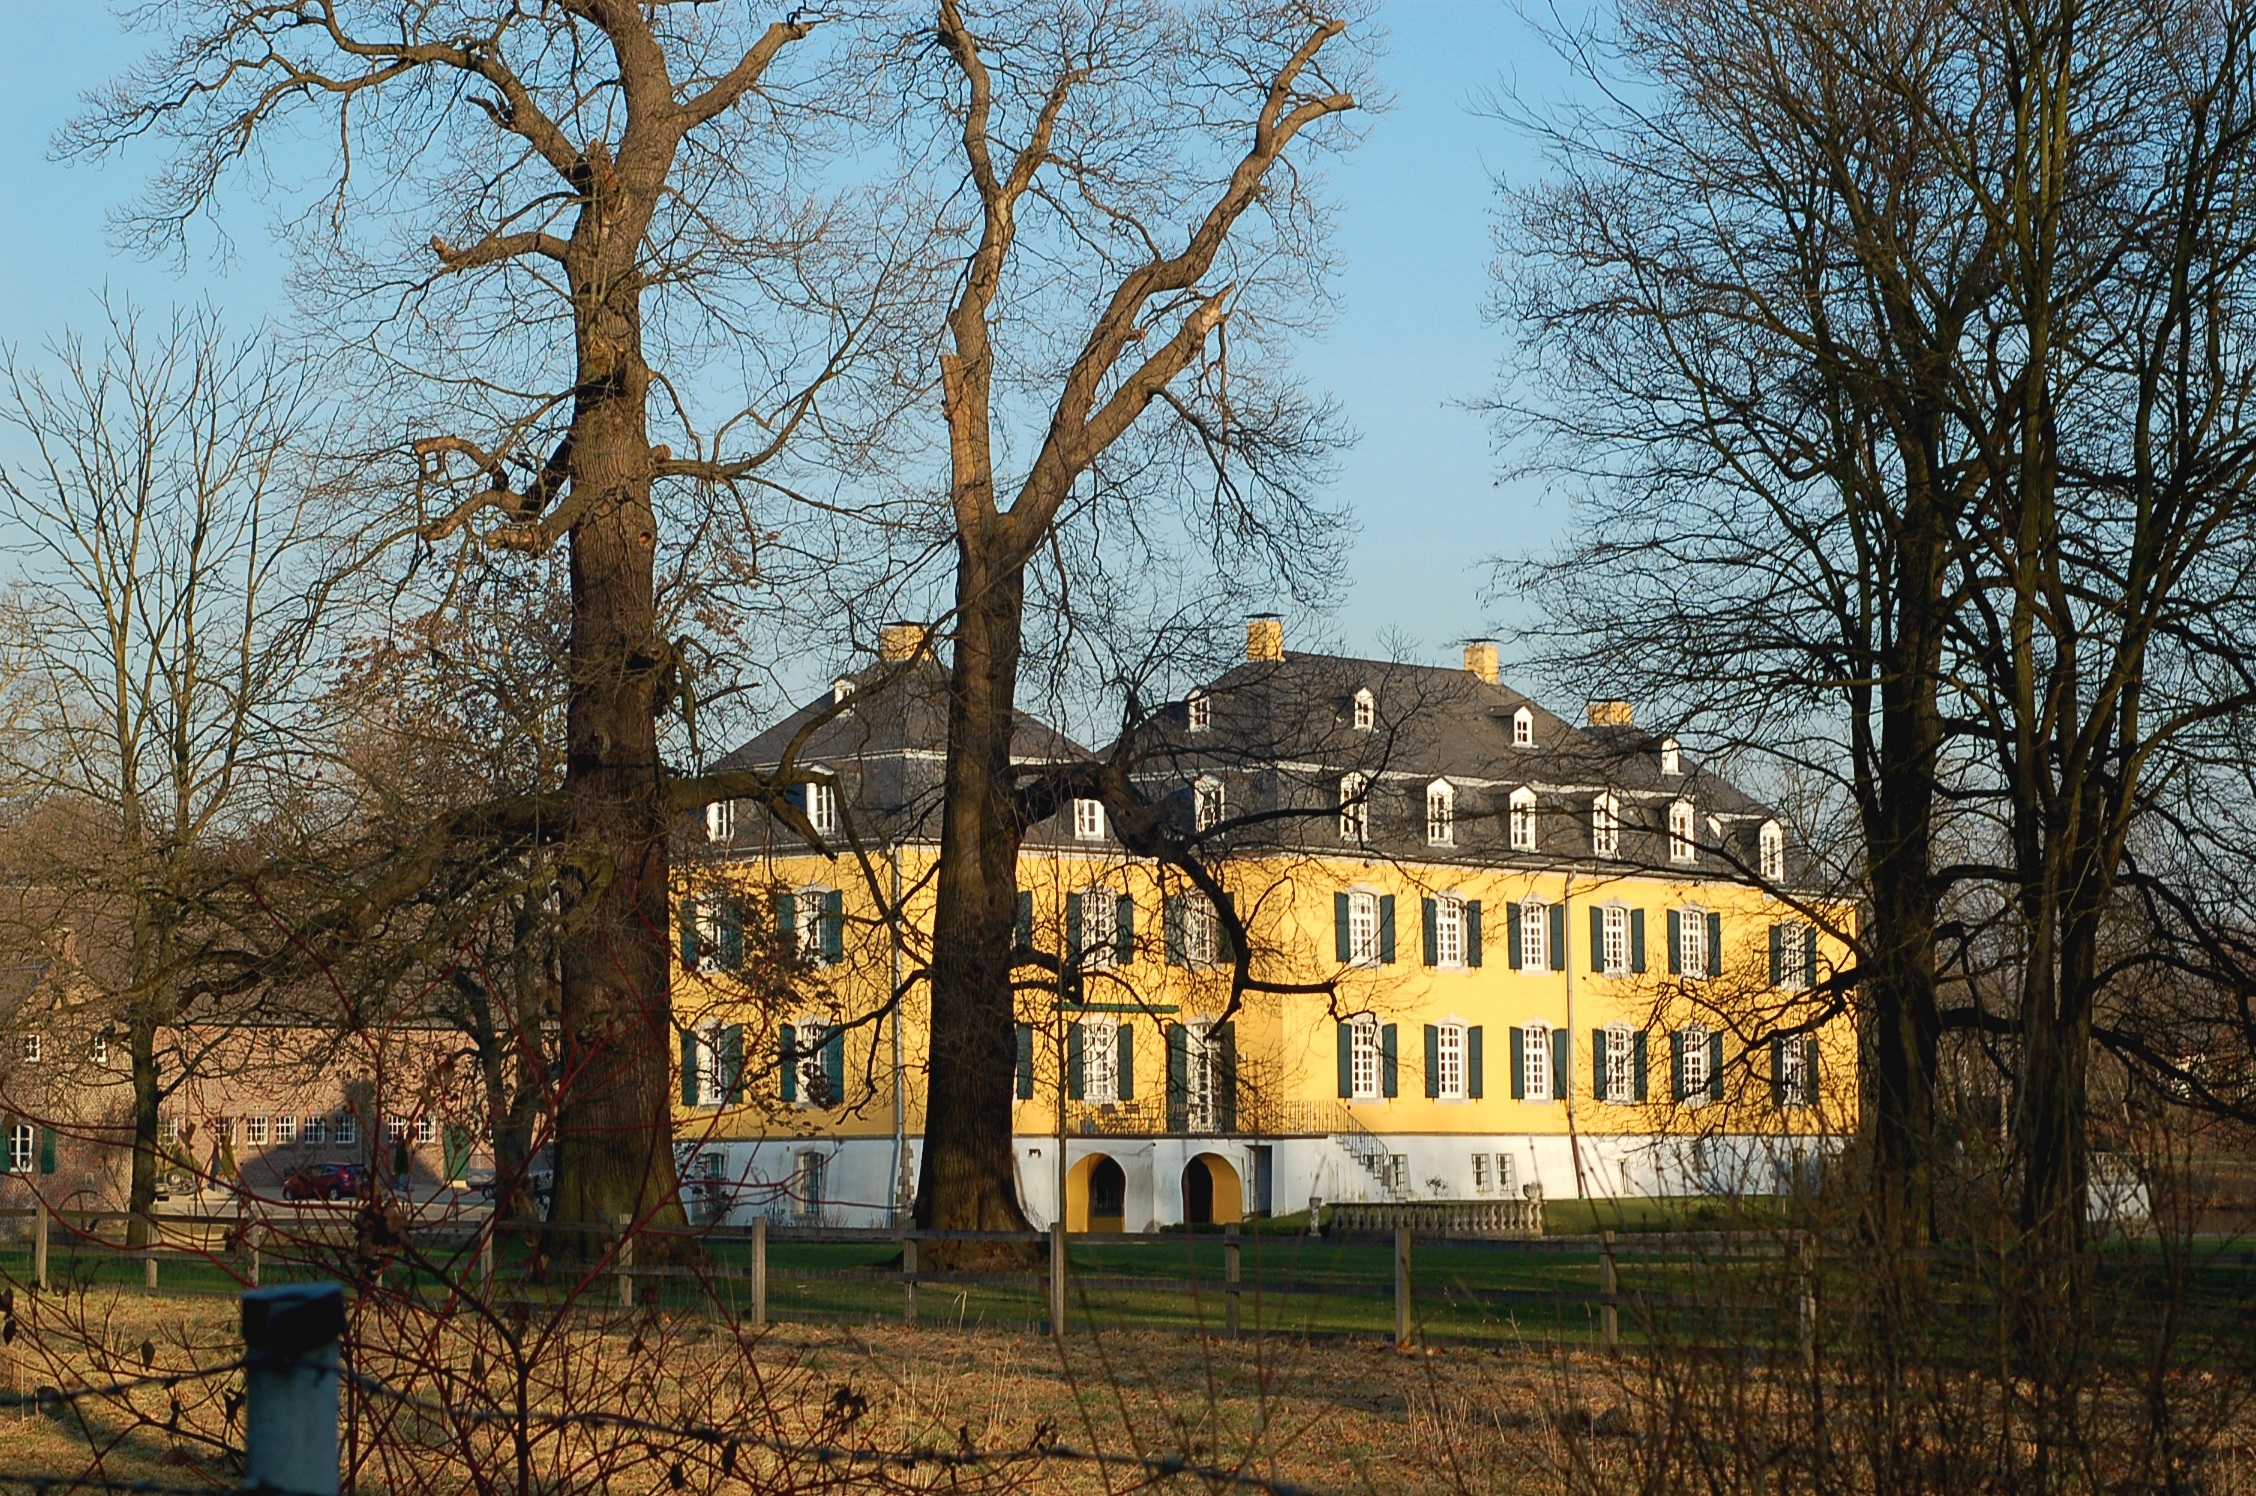 Datei:Haus Hall, Hückelhoven-Ratheim, Bild 3.JPG - Wikipedia